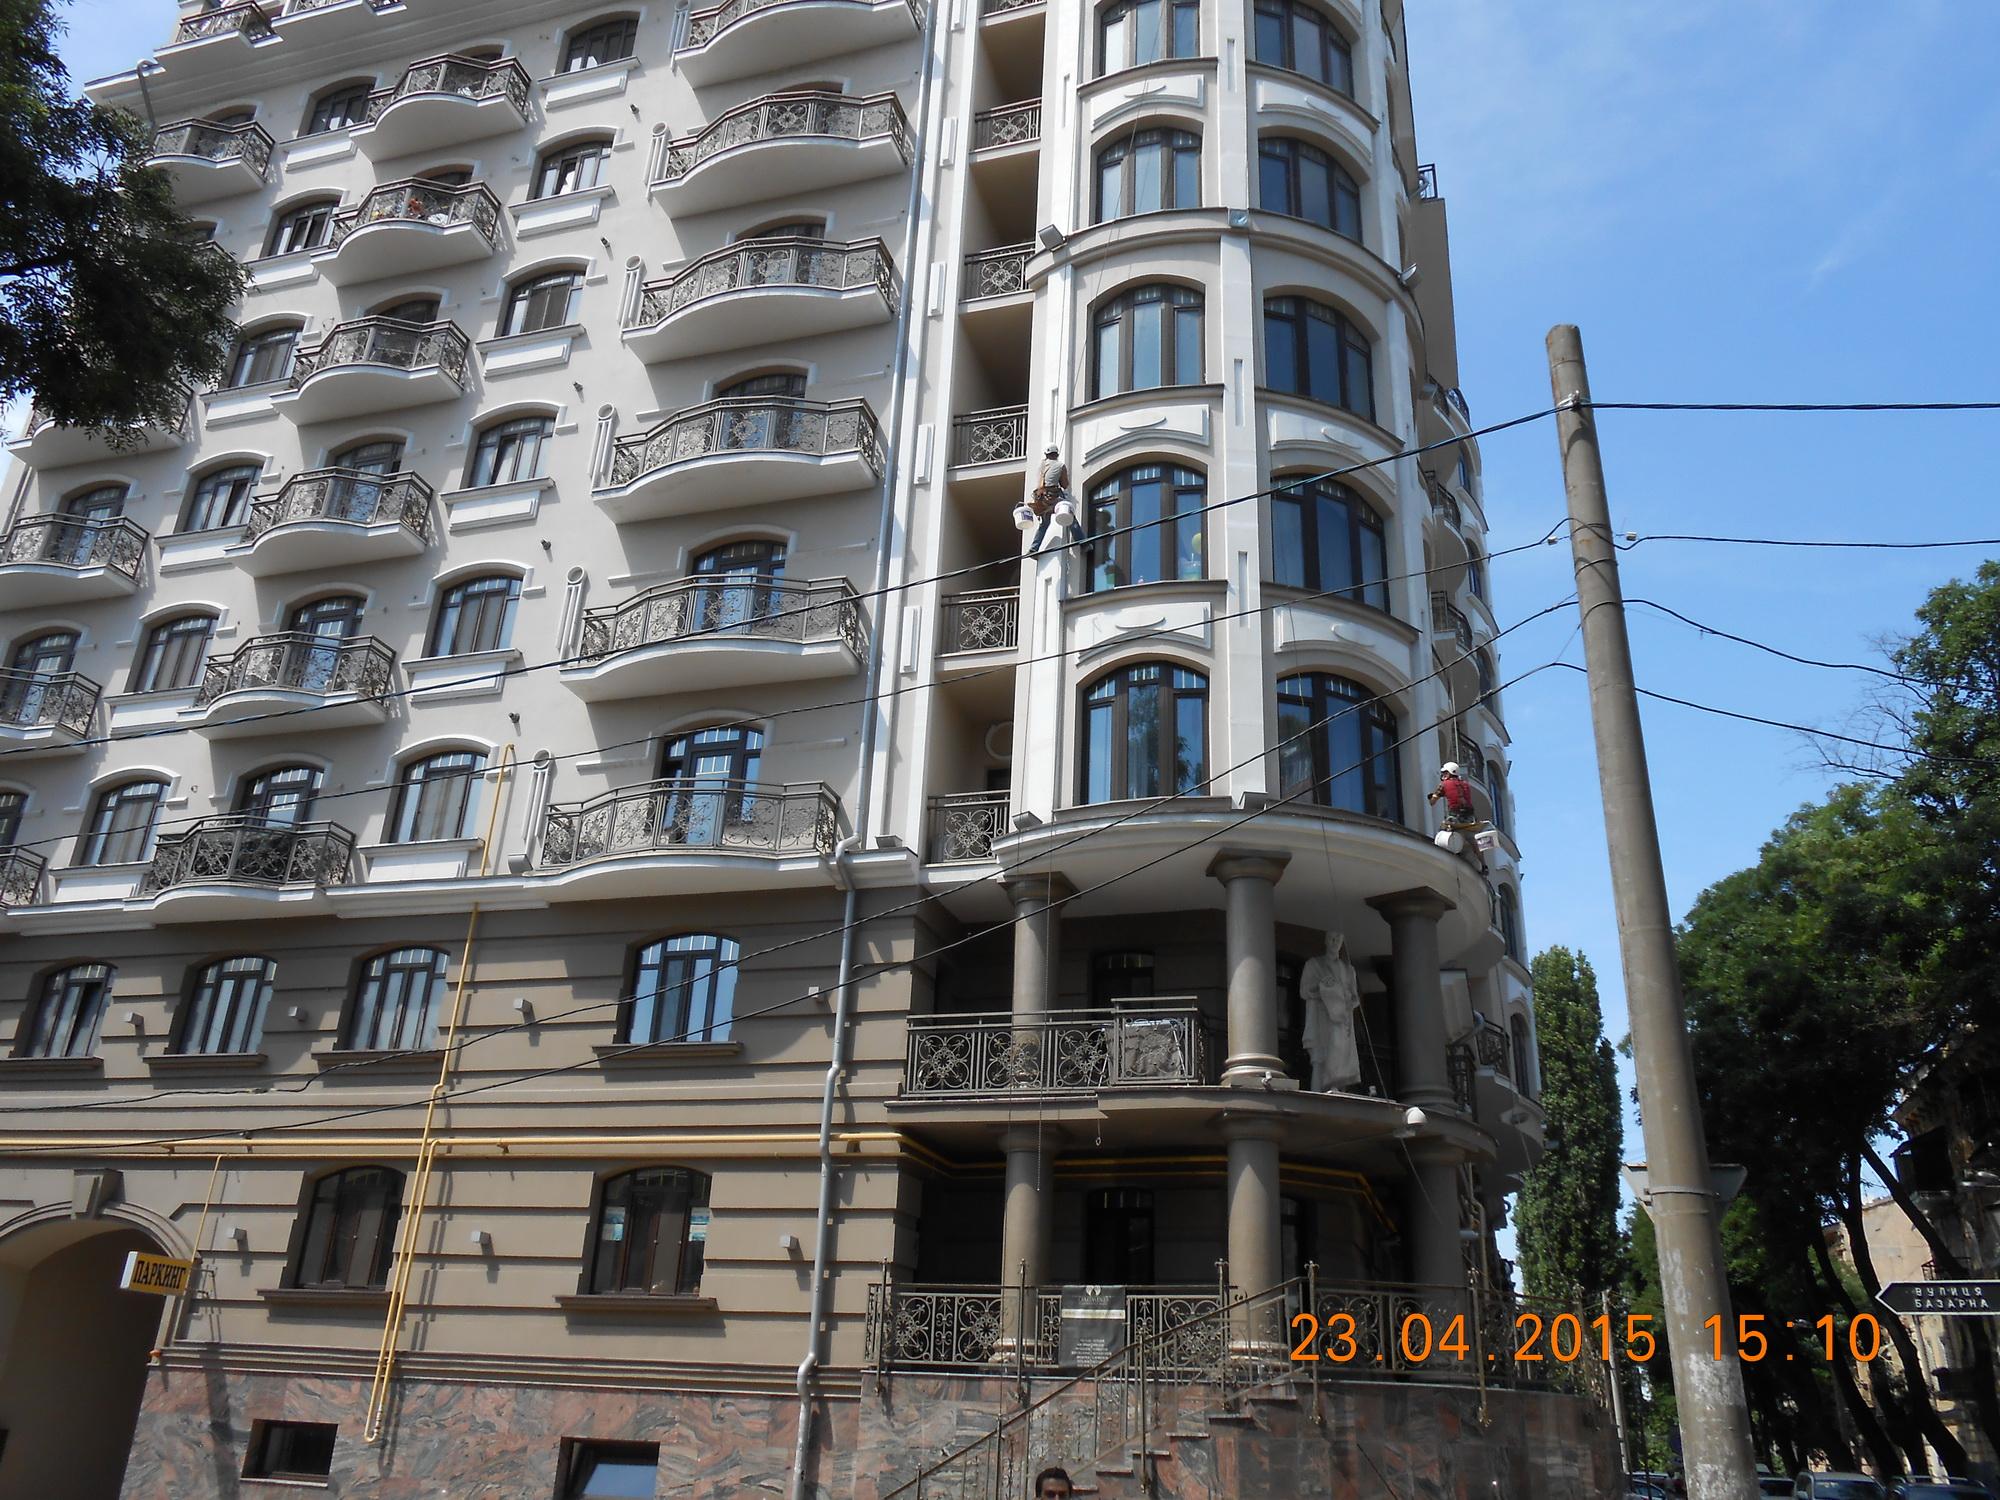 мойка фасадов зданий prom-alpinizm.com.ua